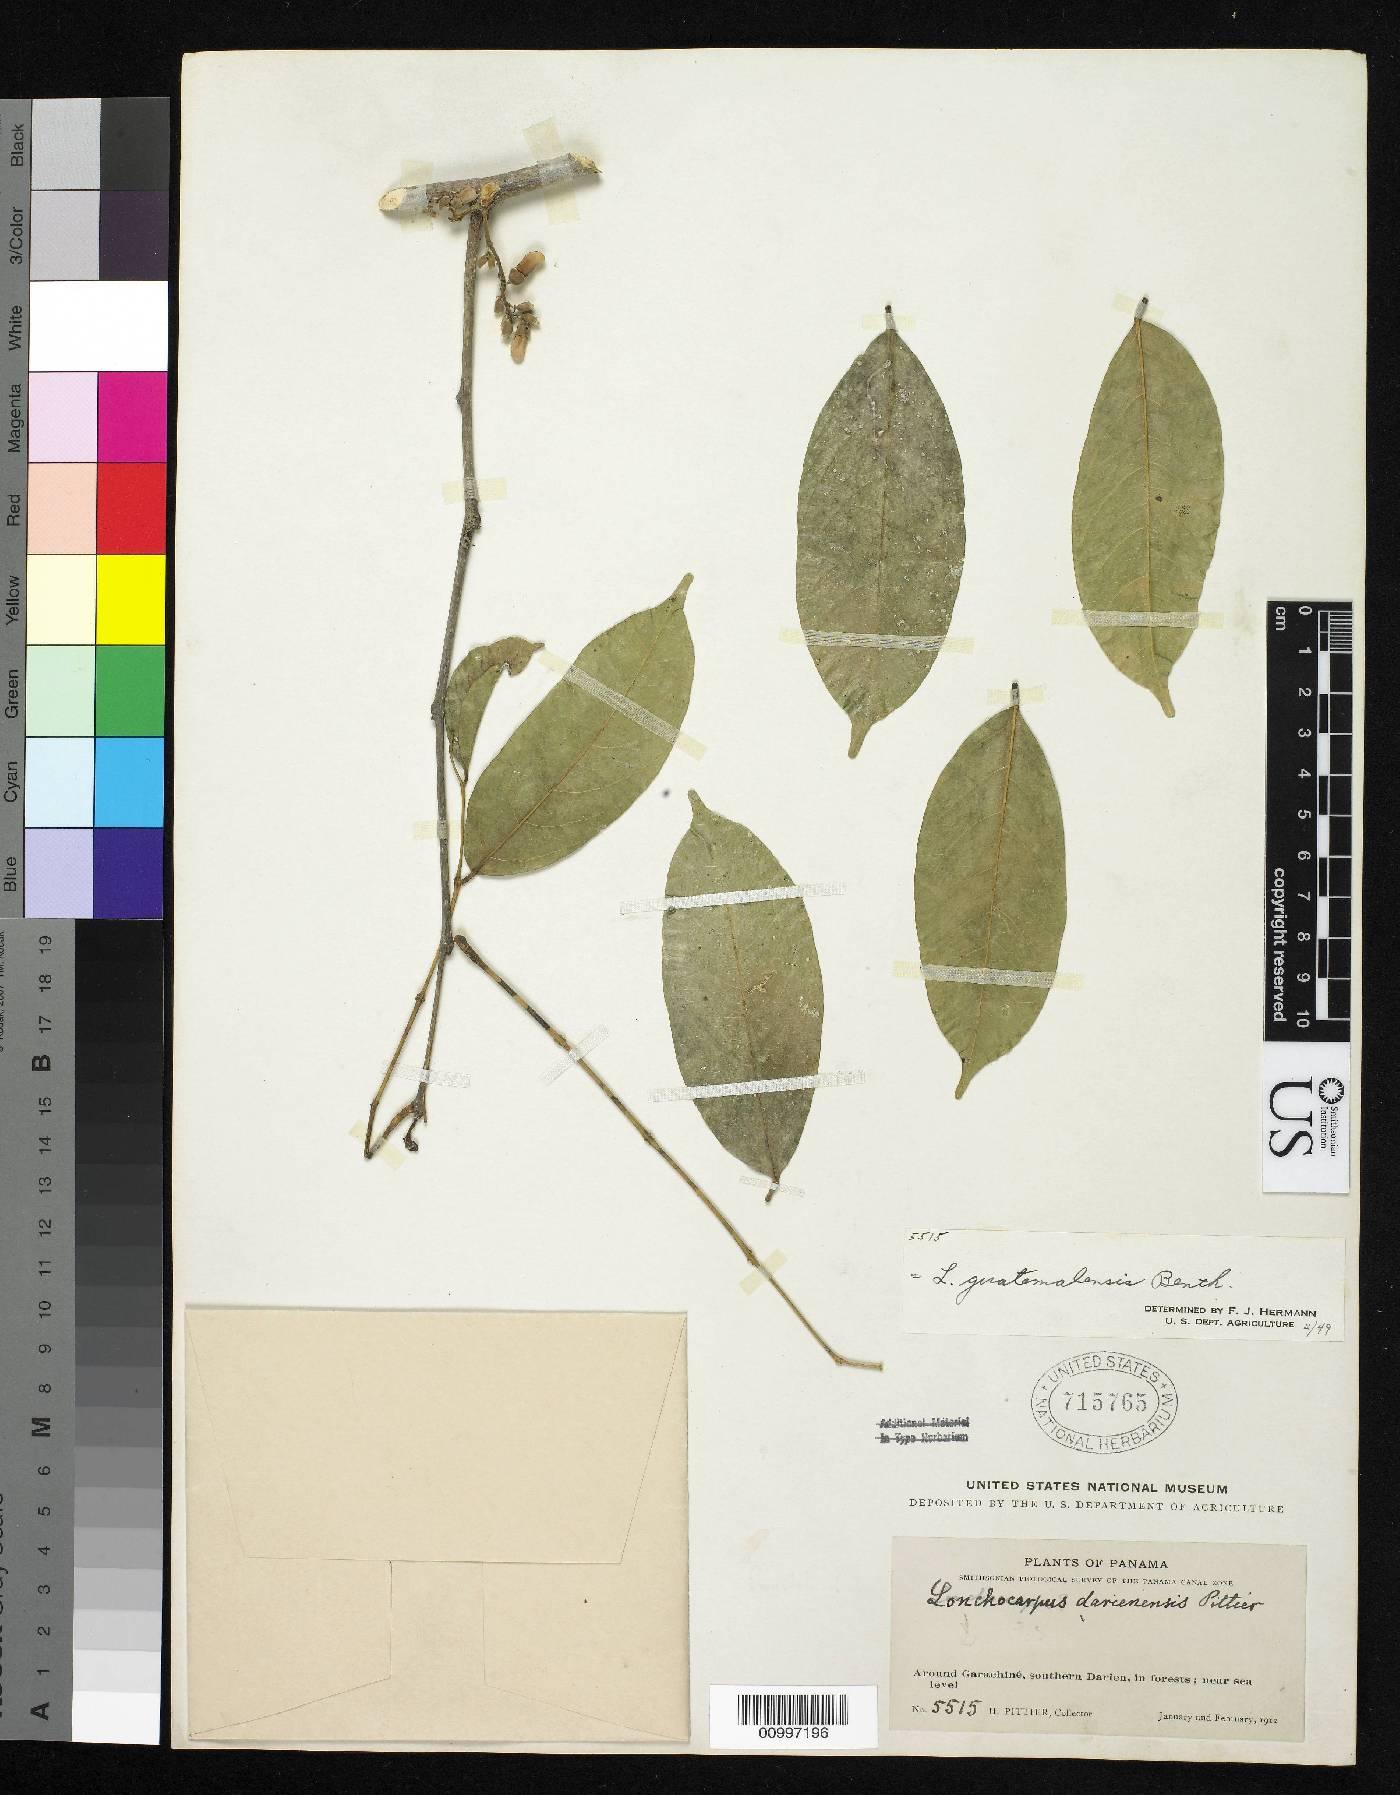 Lonchocarpus guatemalensis image